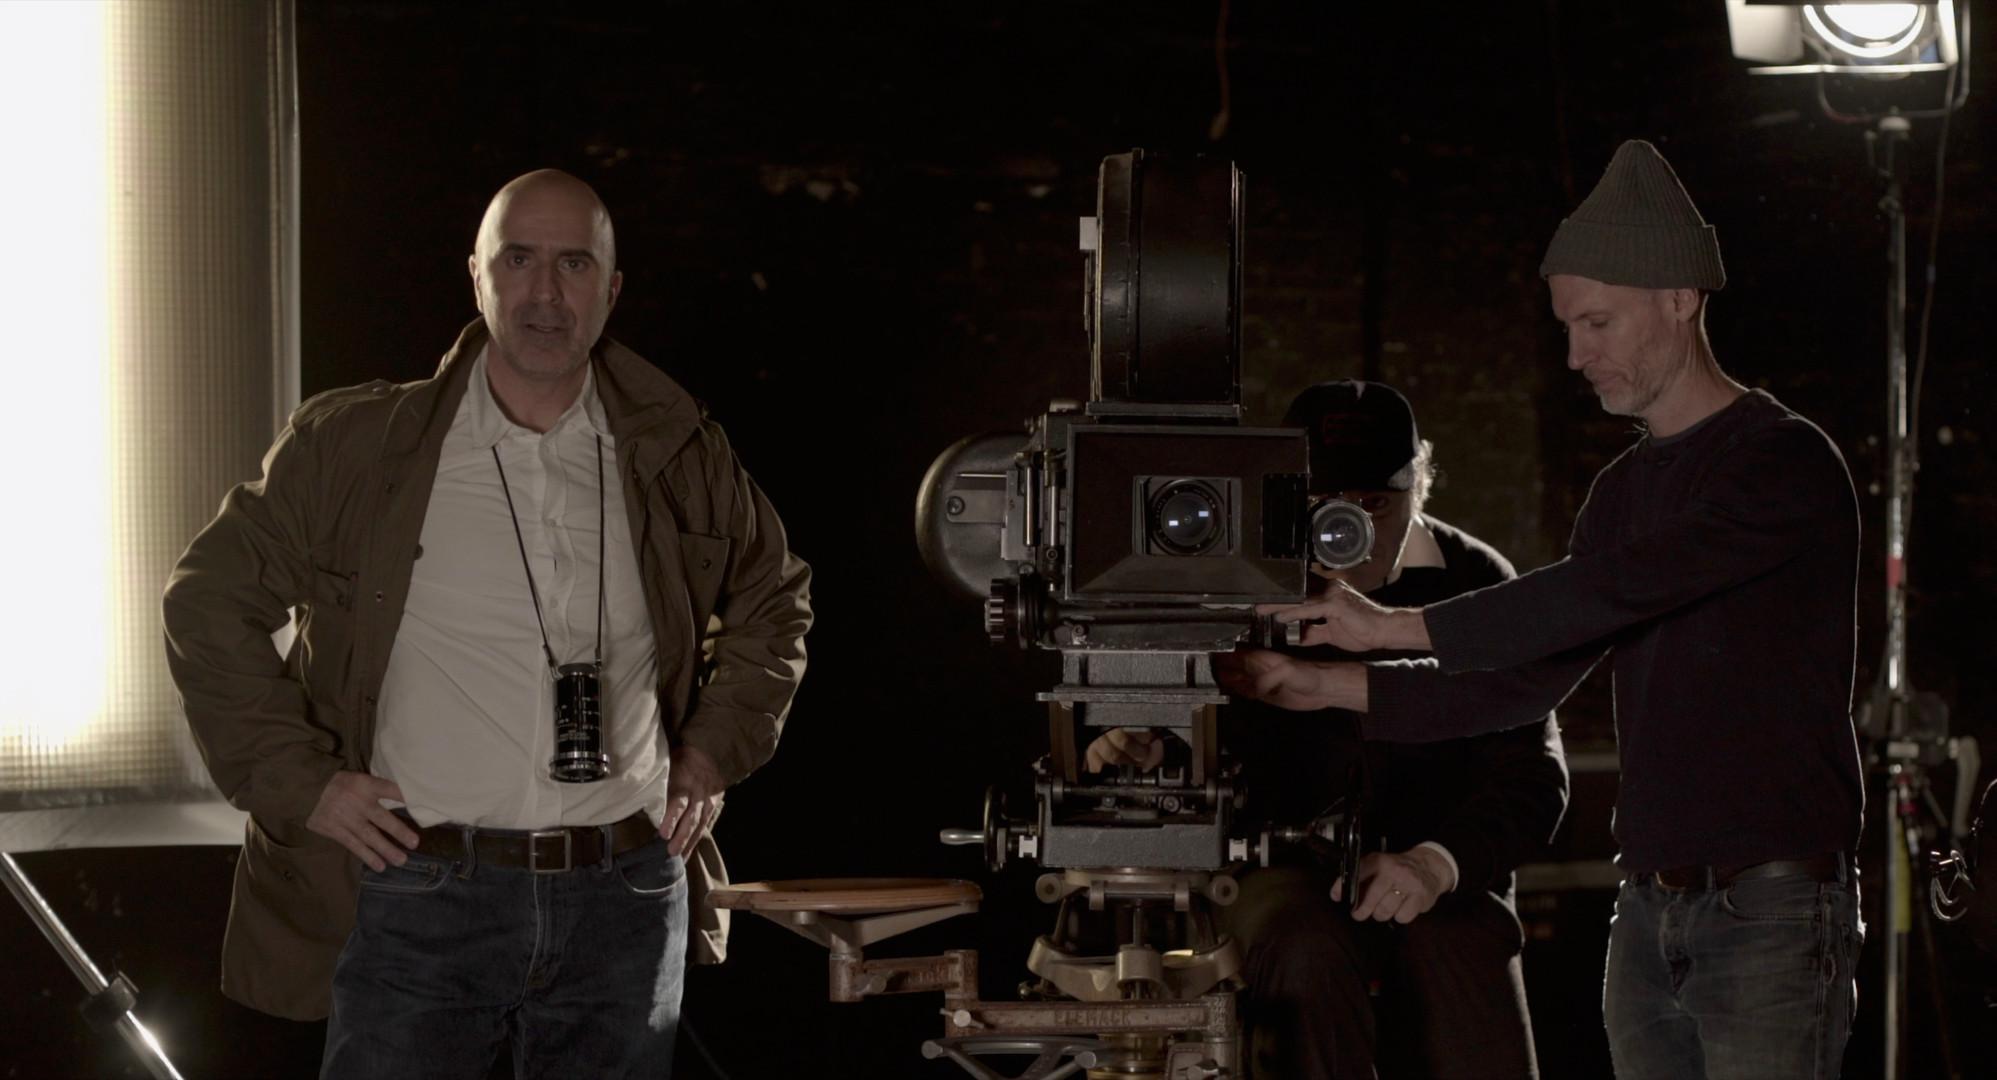 Le Cineaste - Still 24.jpg